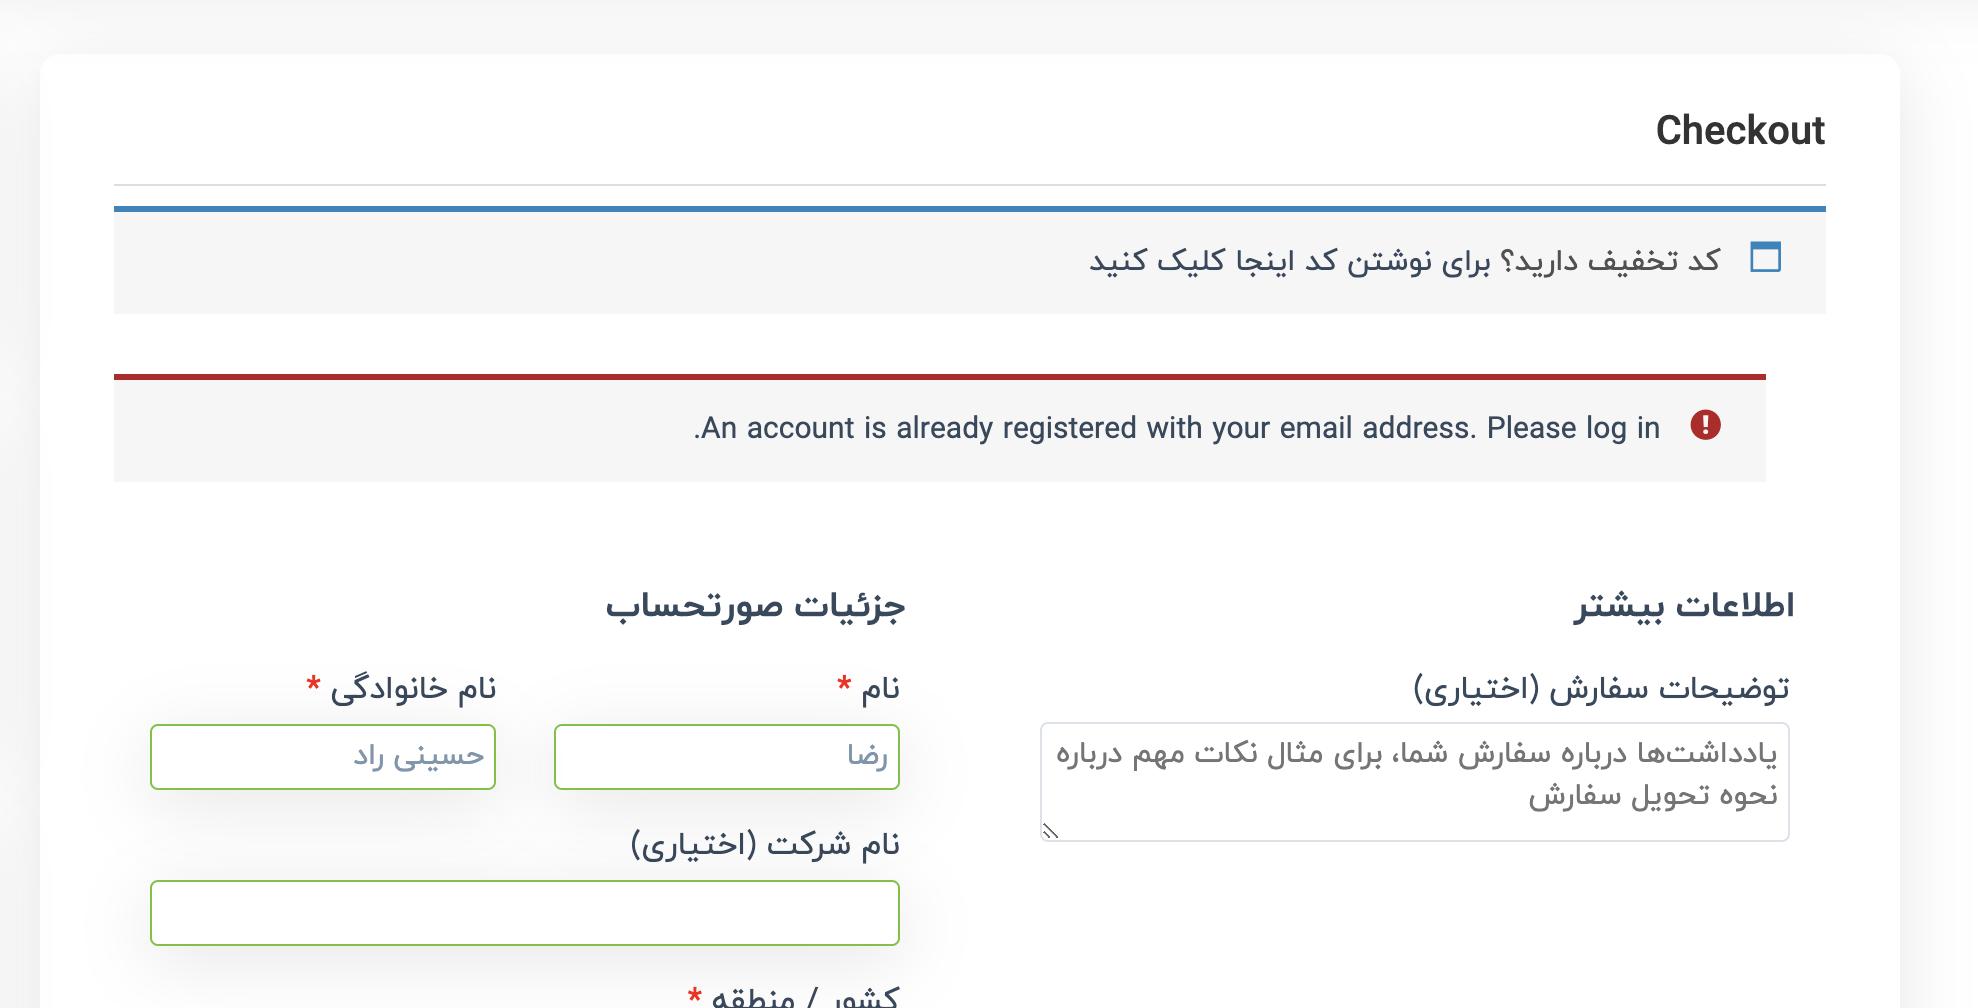 خطای An account is already registered with your email address